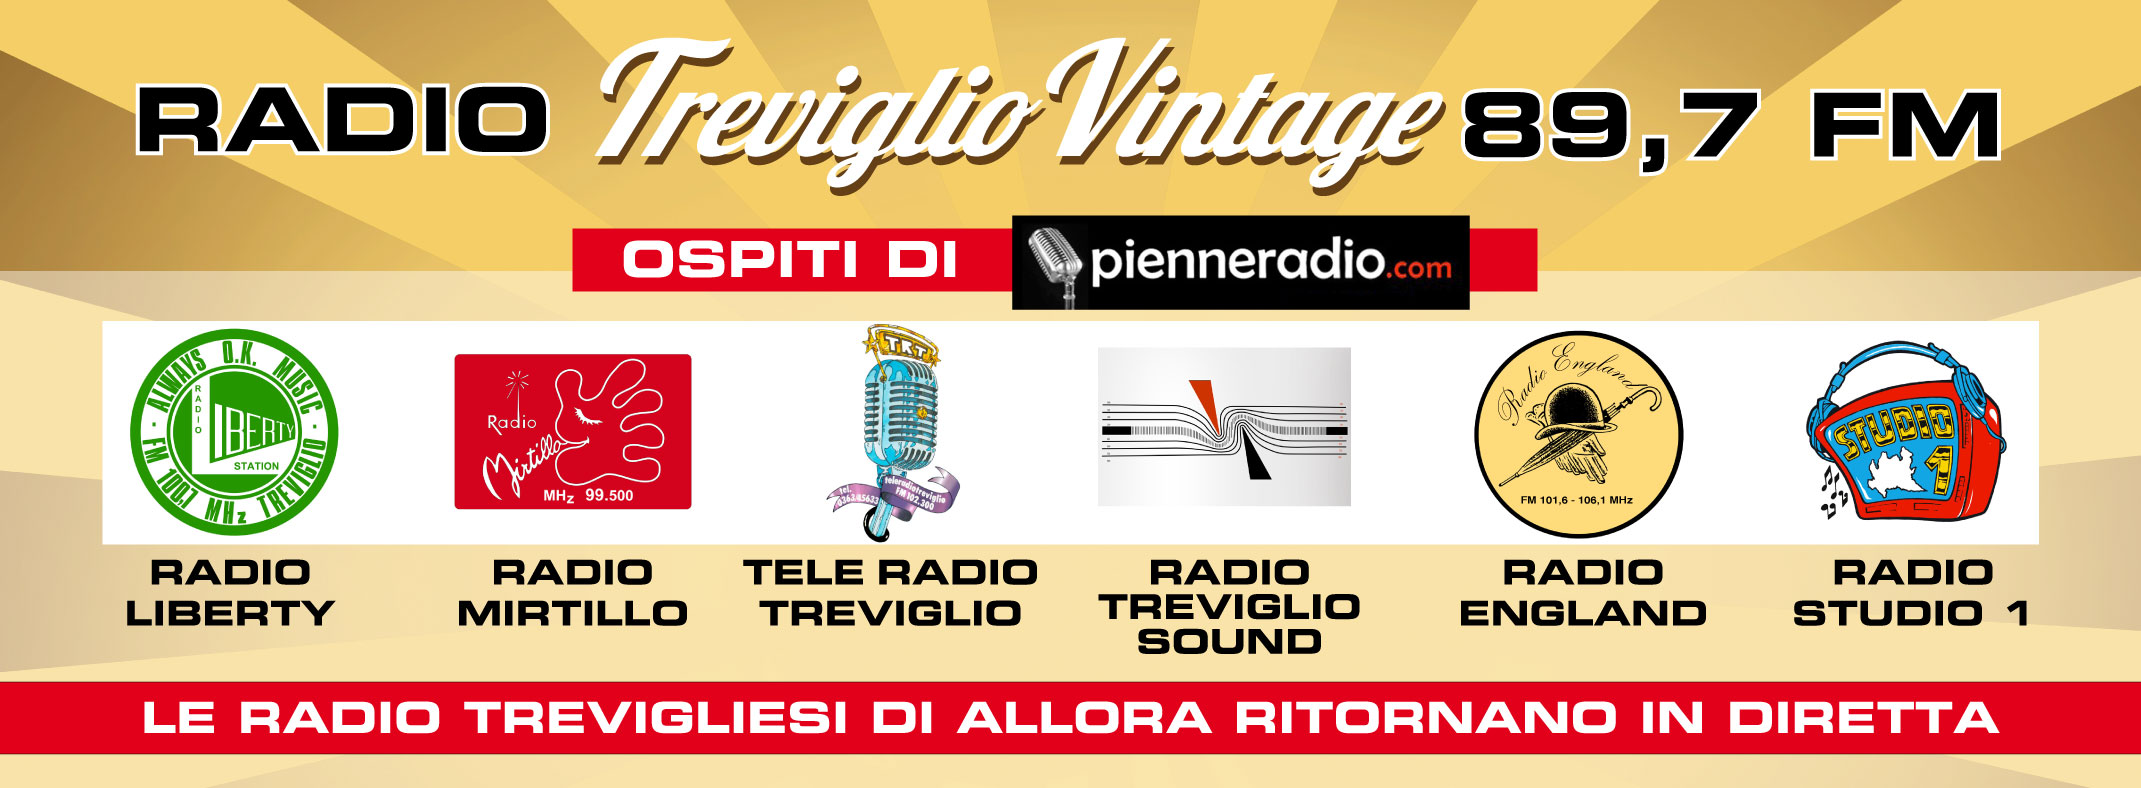 Radio Treviglio Vintage On Air